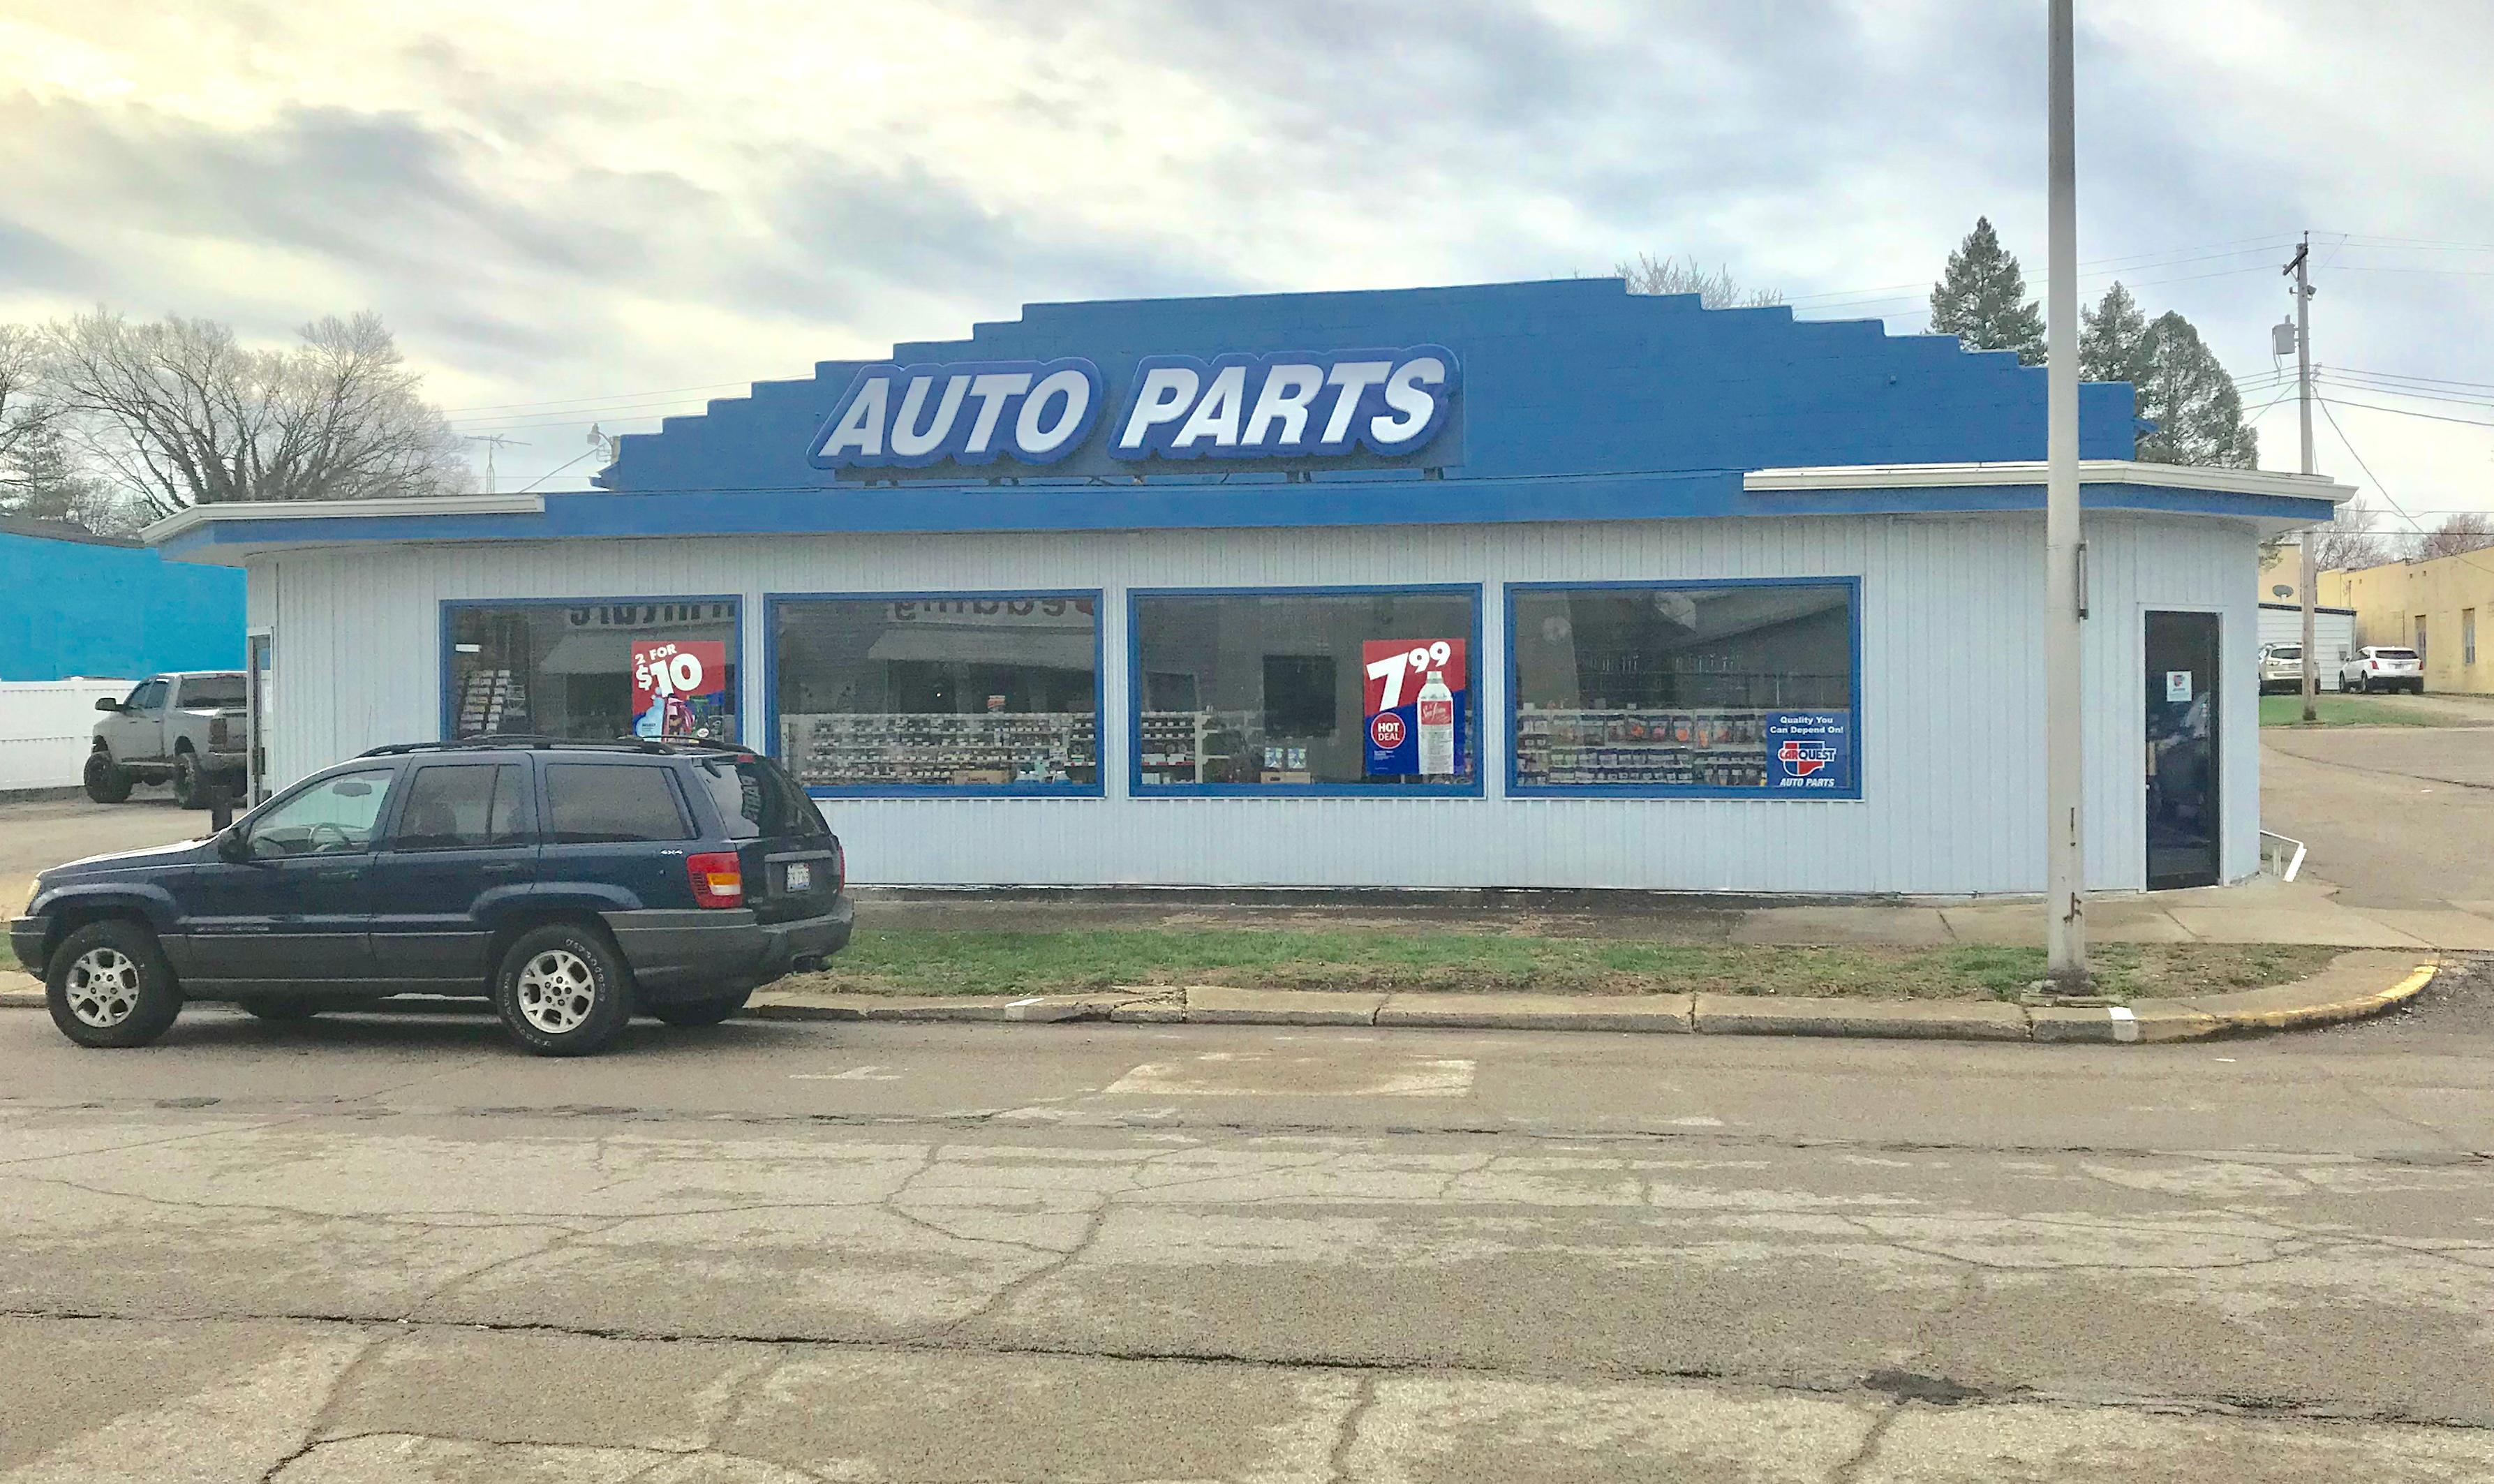 Carquest Auto Parts - Vadas Auto Parts image 0